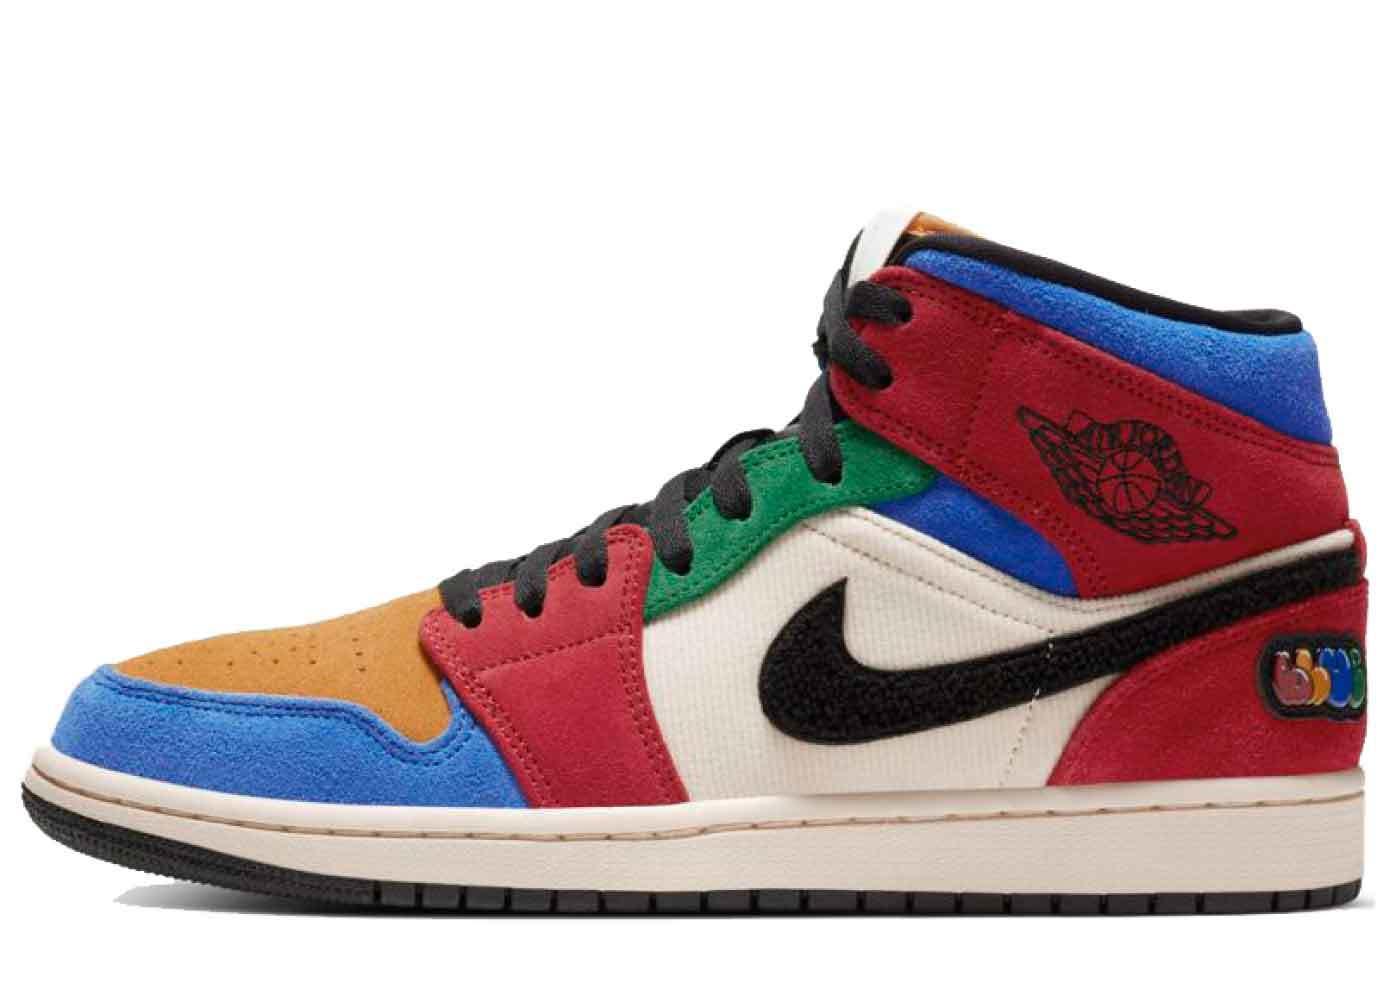 Nike Air Jordan 1 Mid SE Fearless Blue the Greatの写真